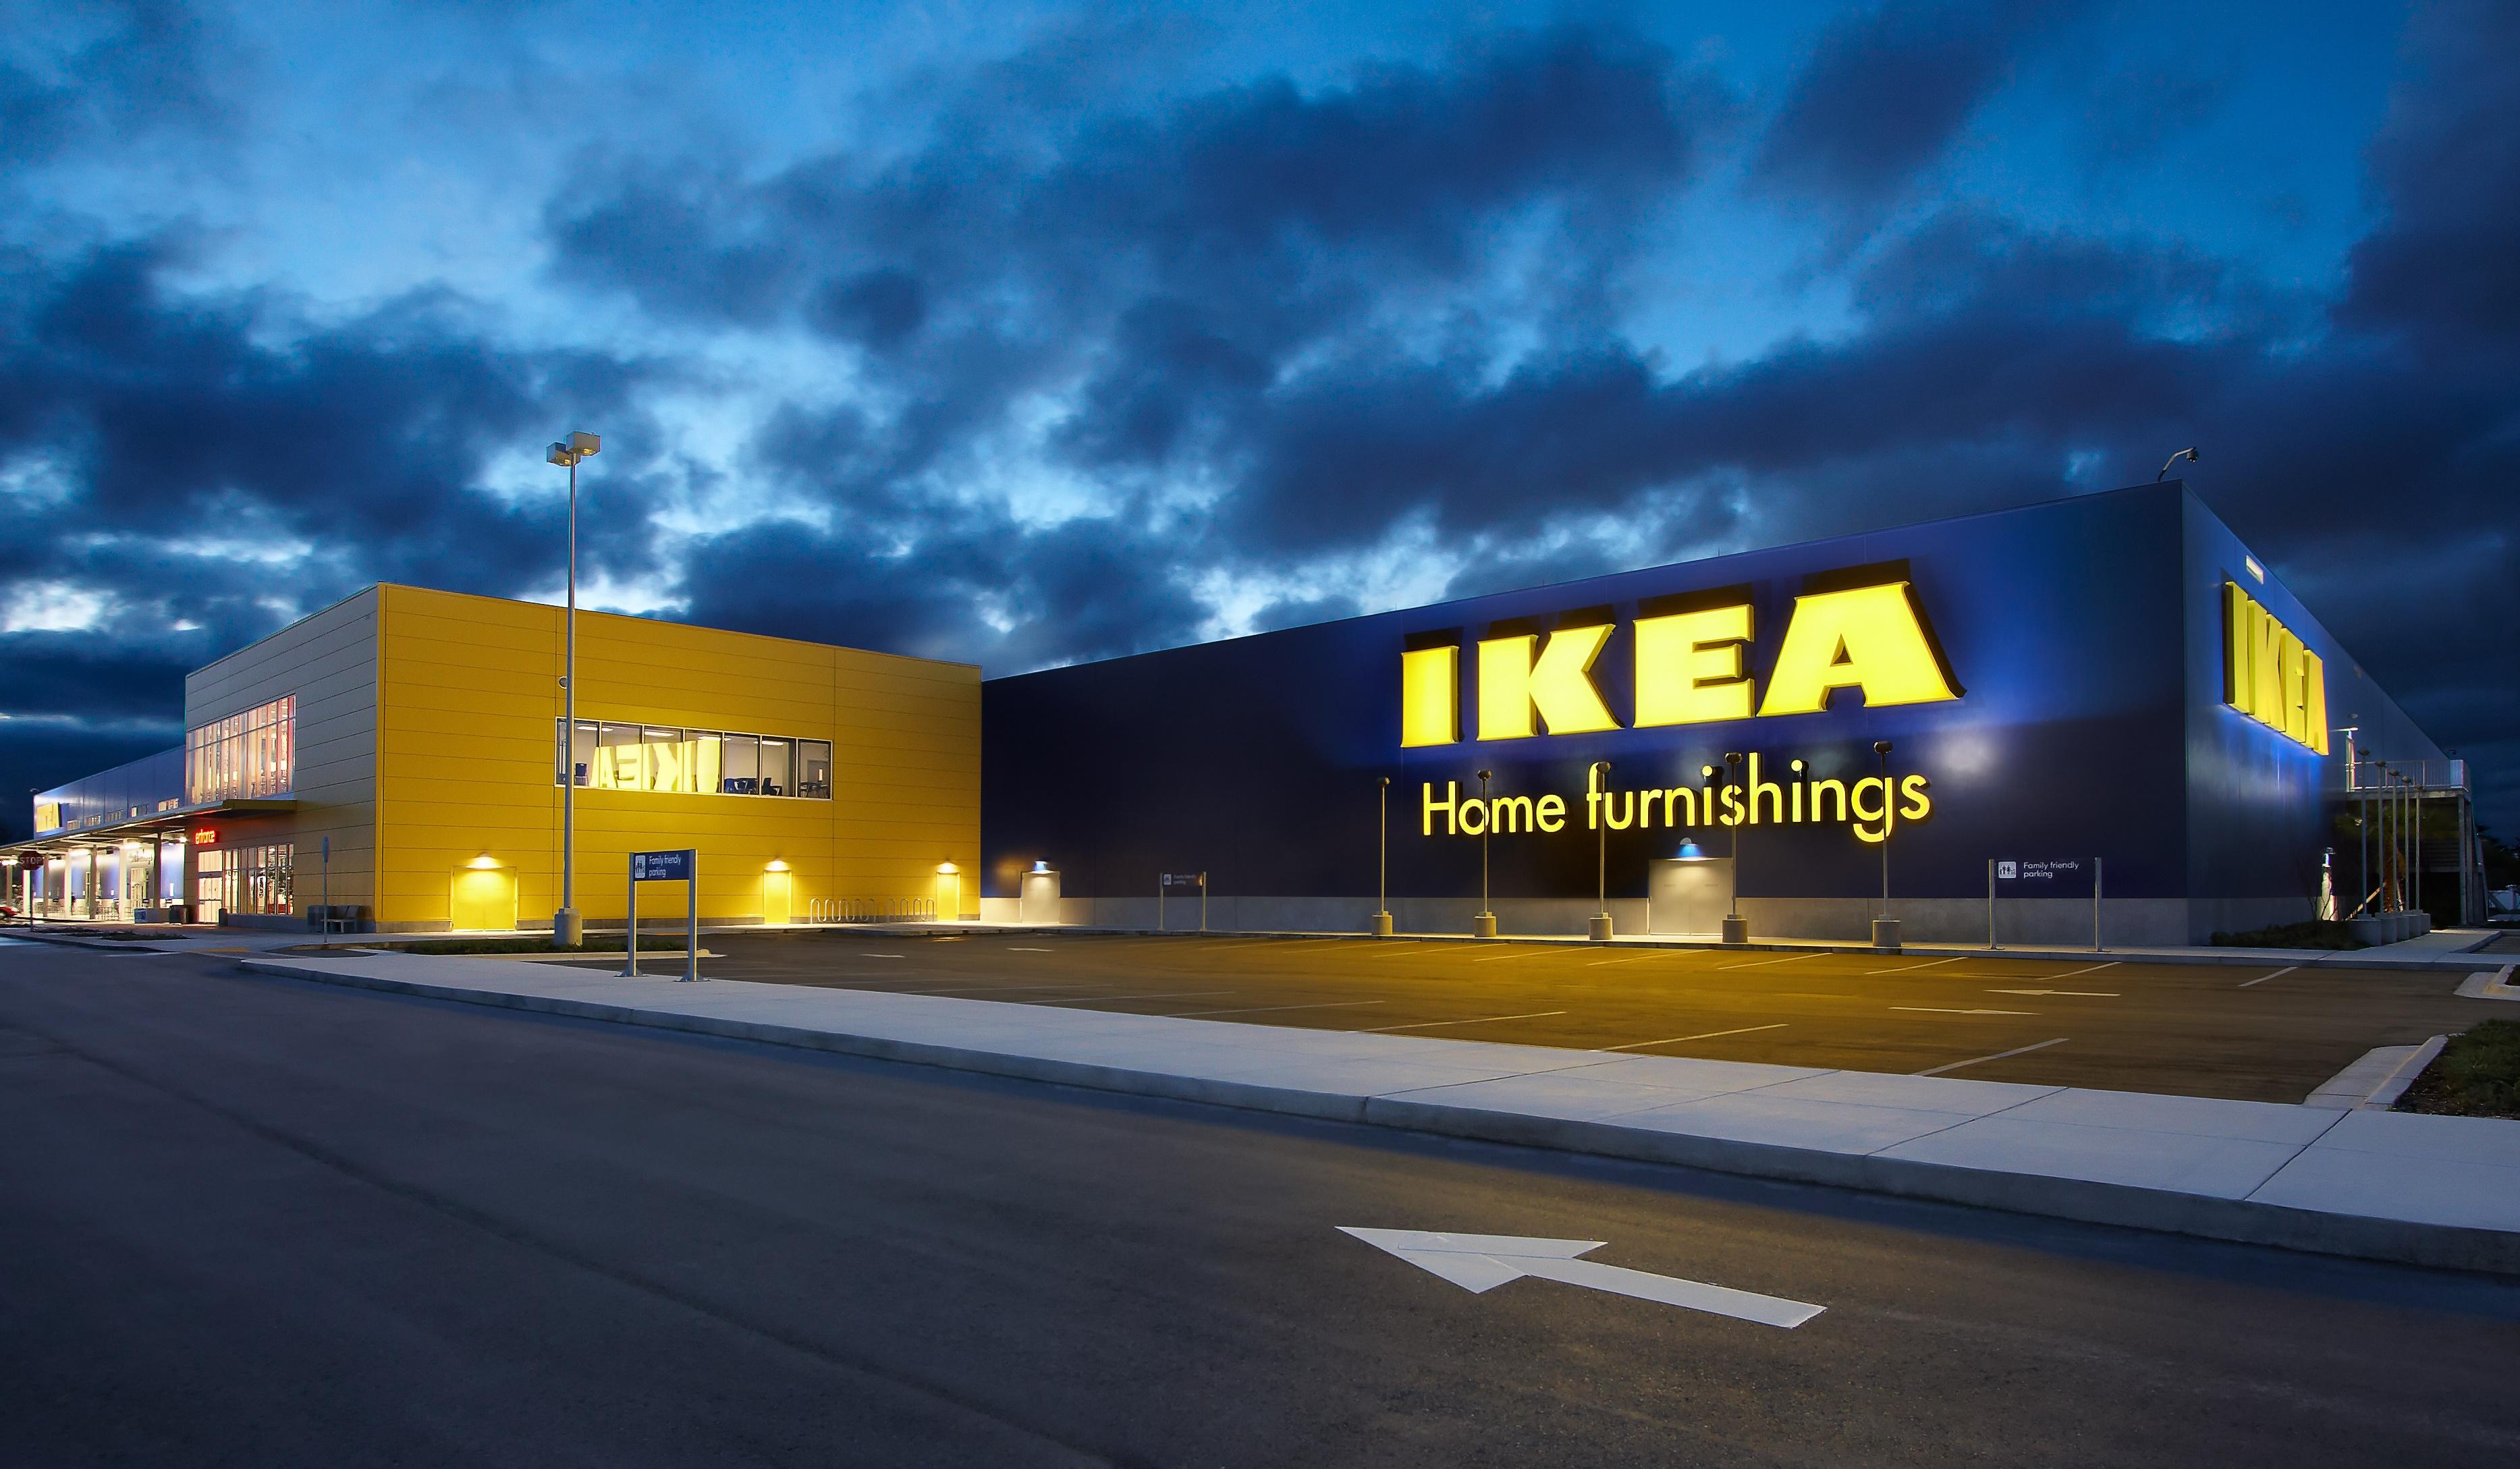 Ikea-1-1.jpg